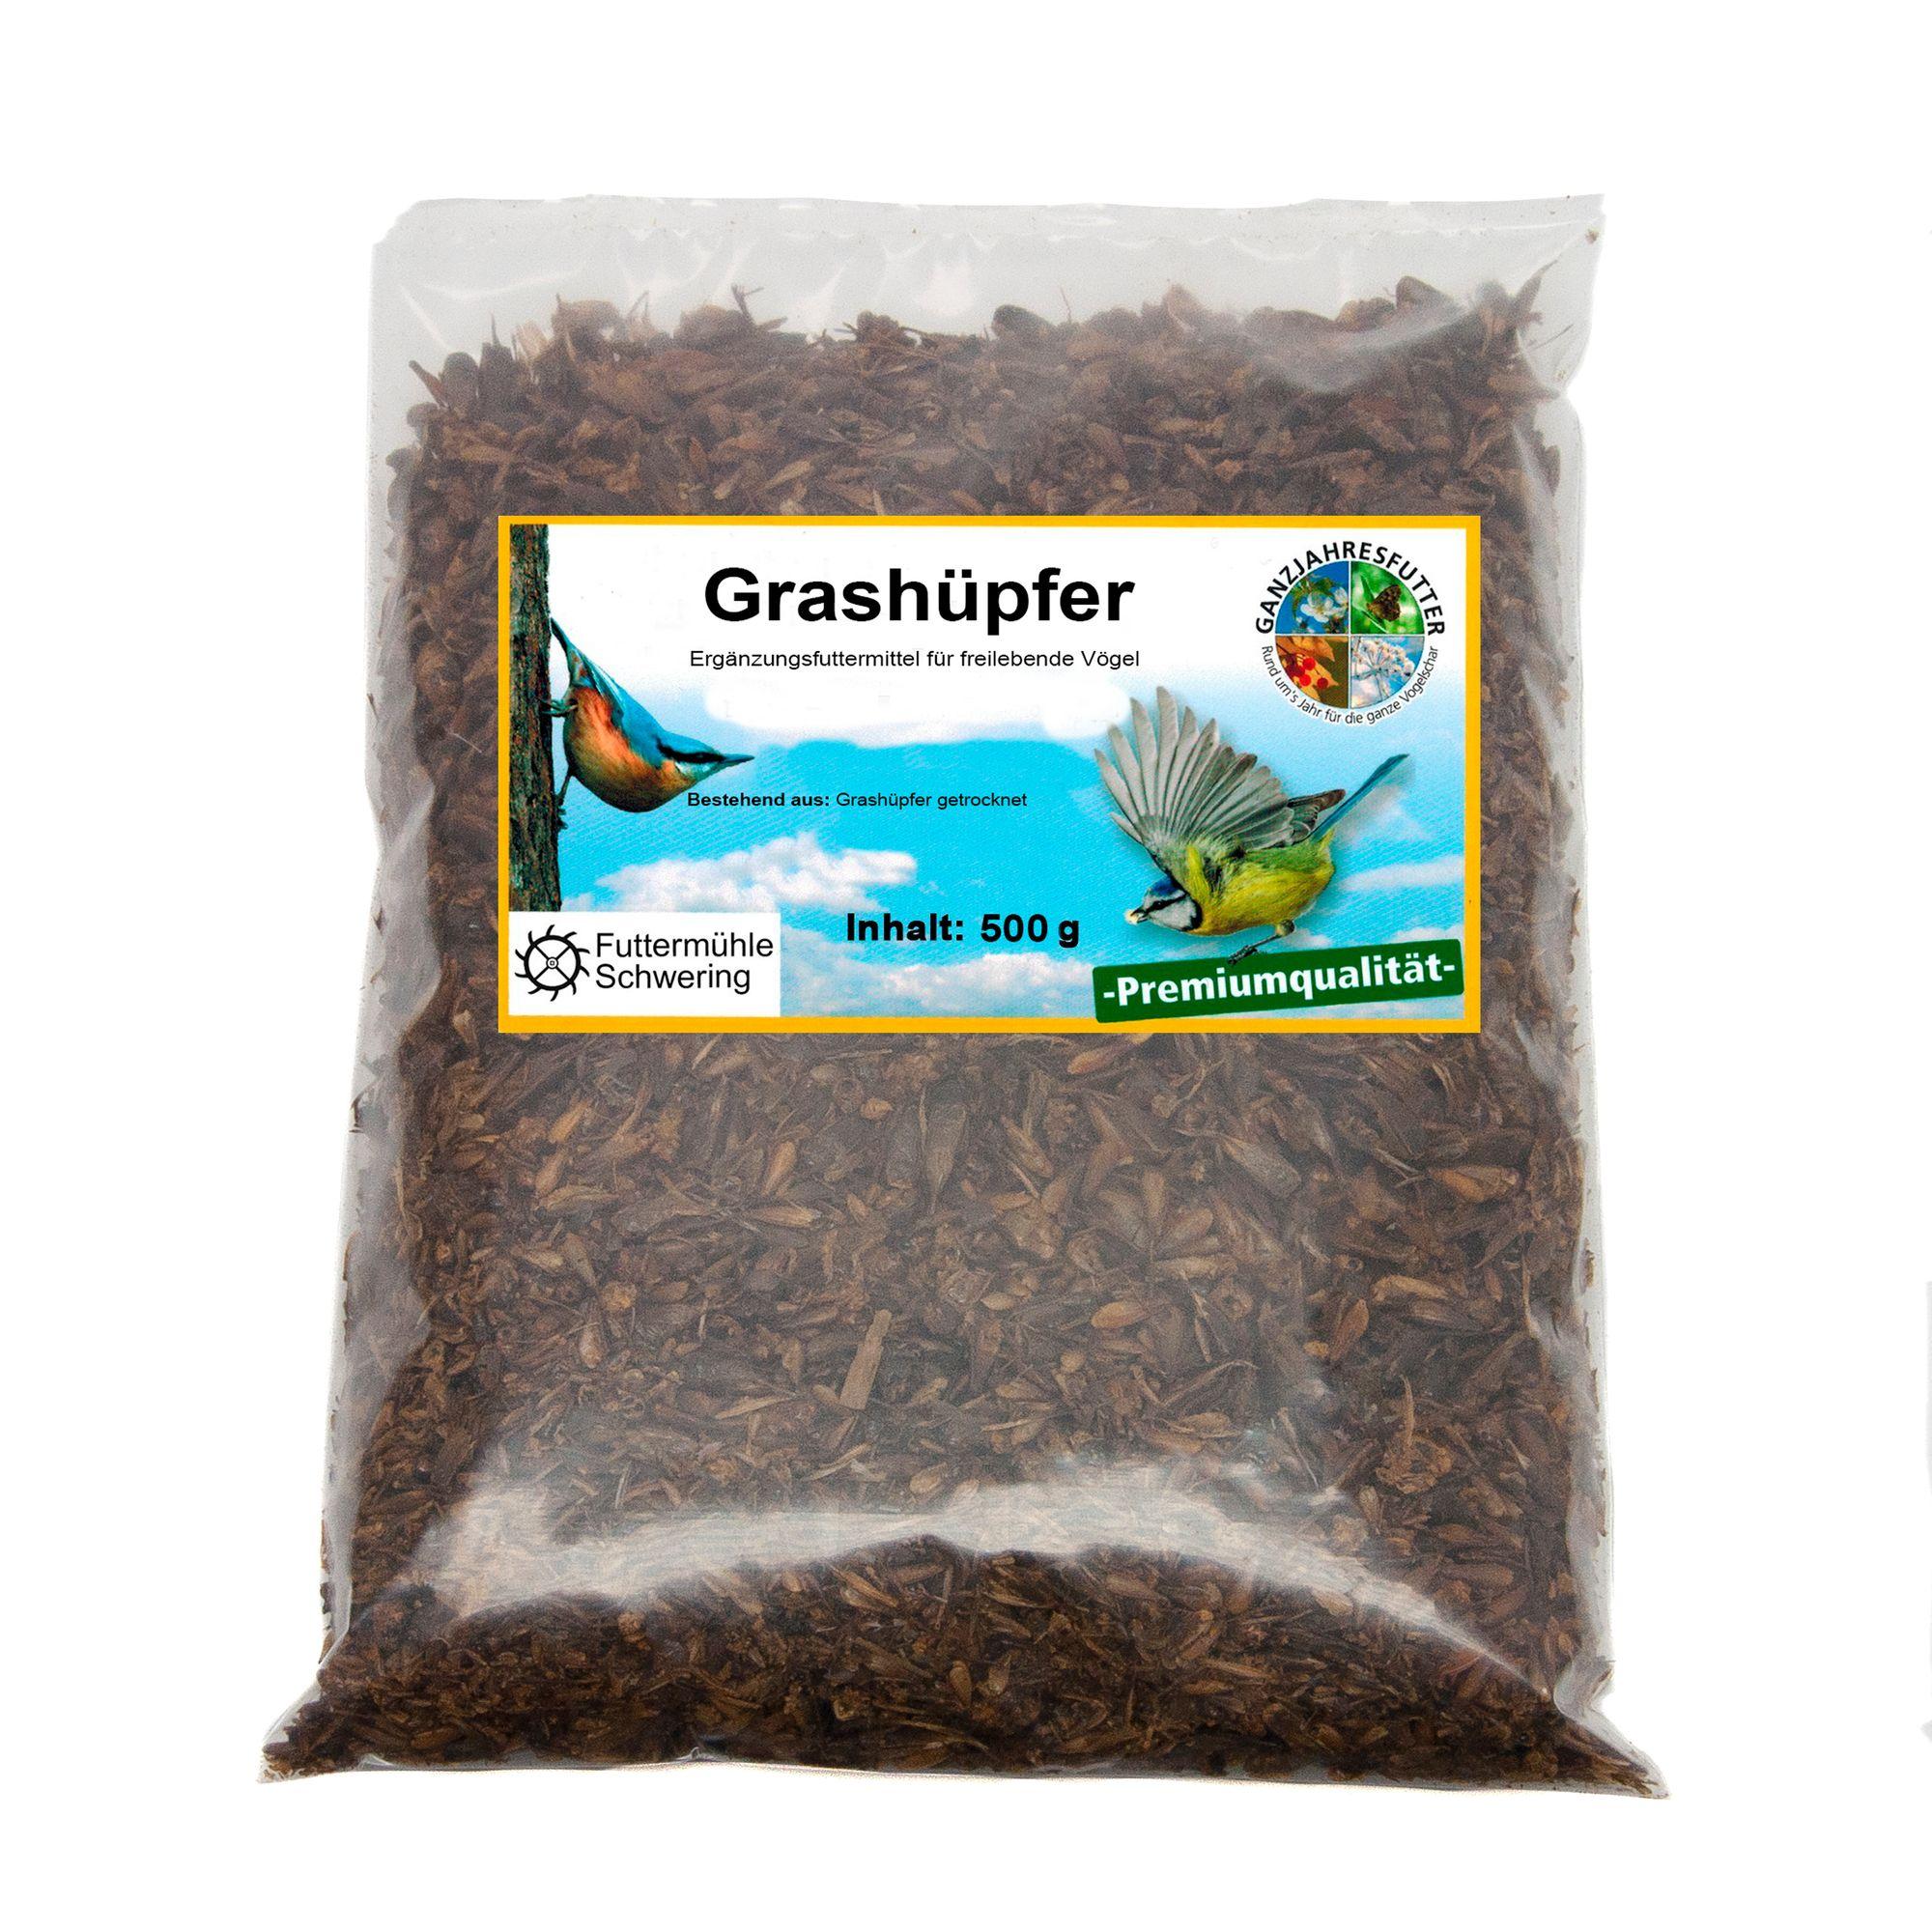 Grashüpfer getrocknet 500 g Beutel